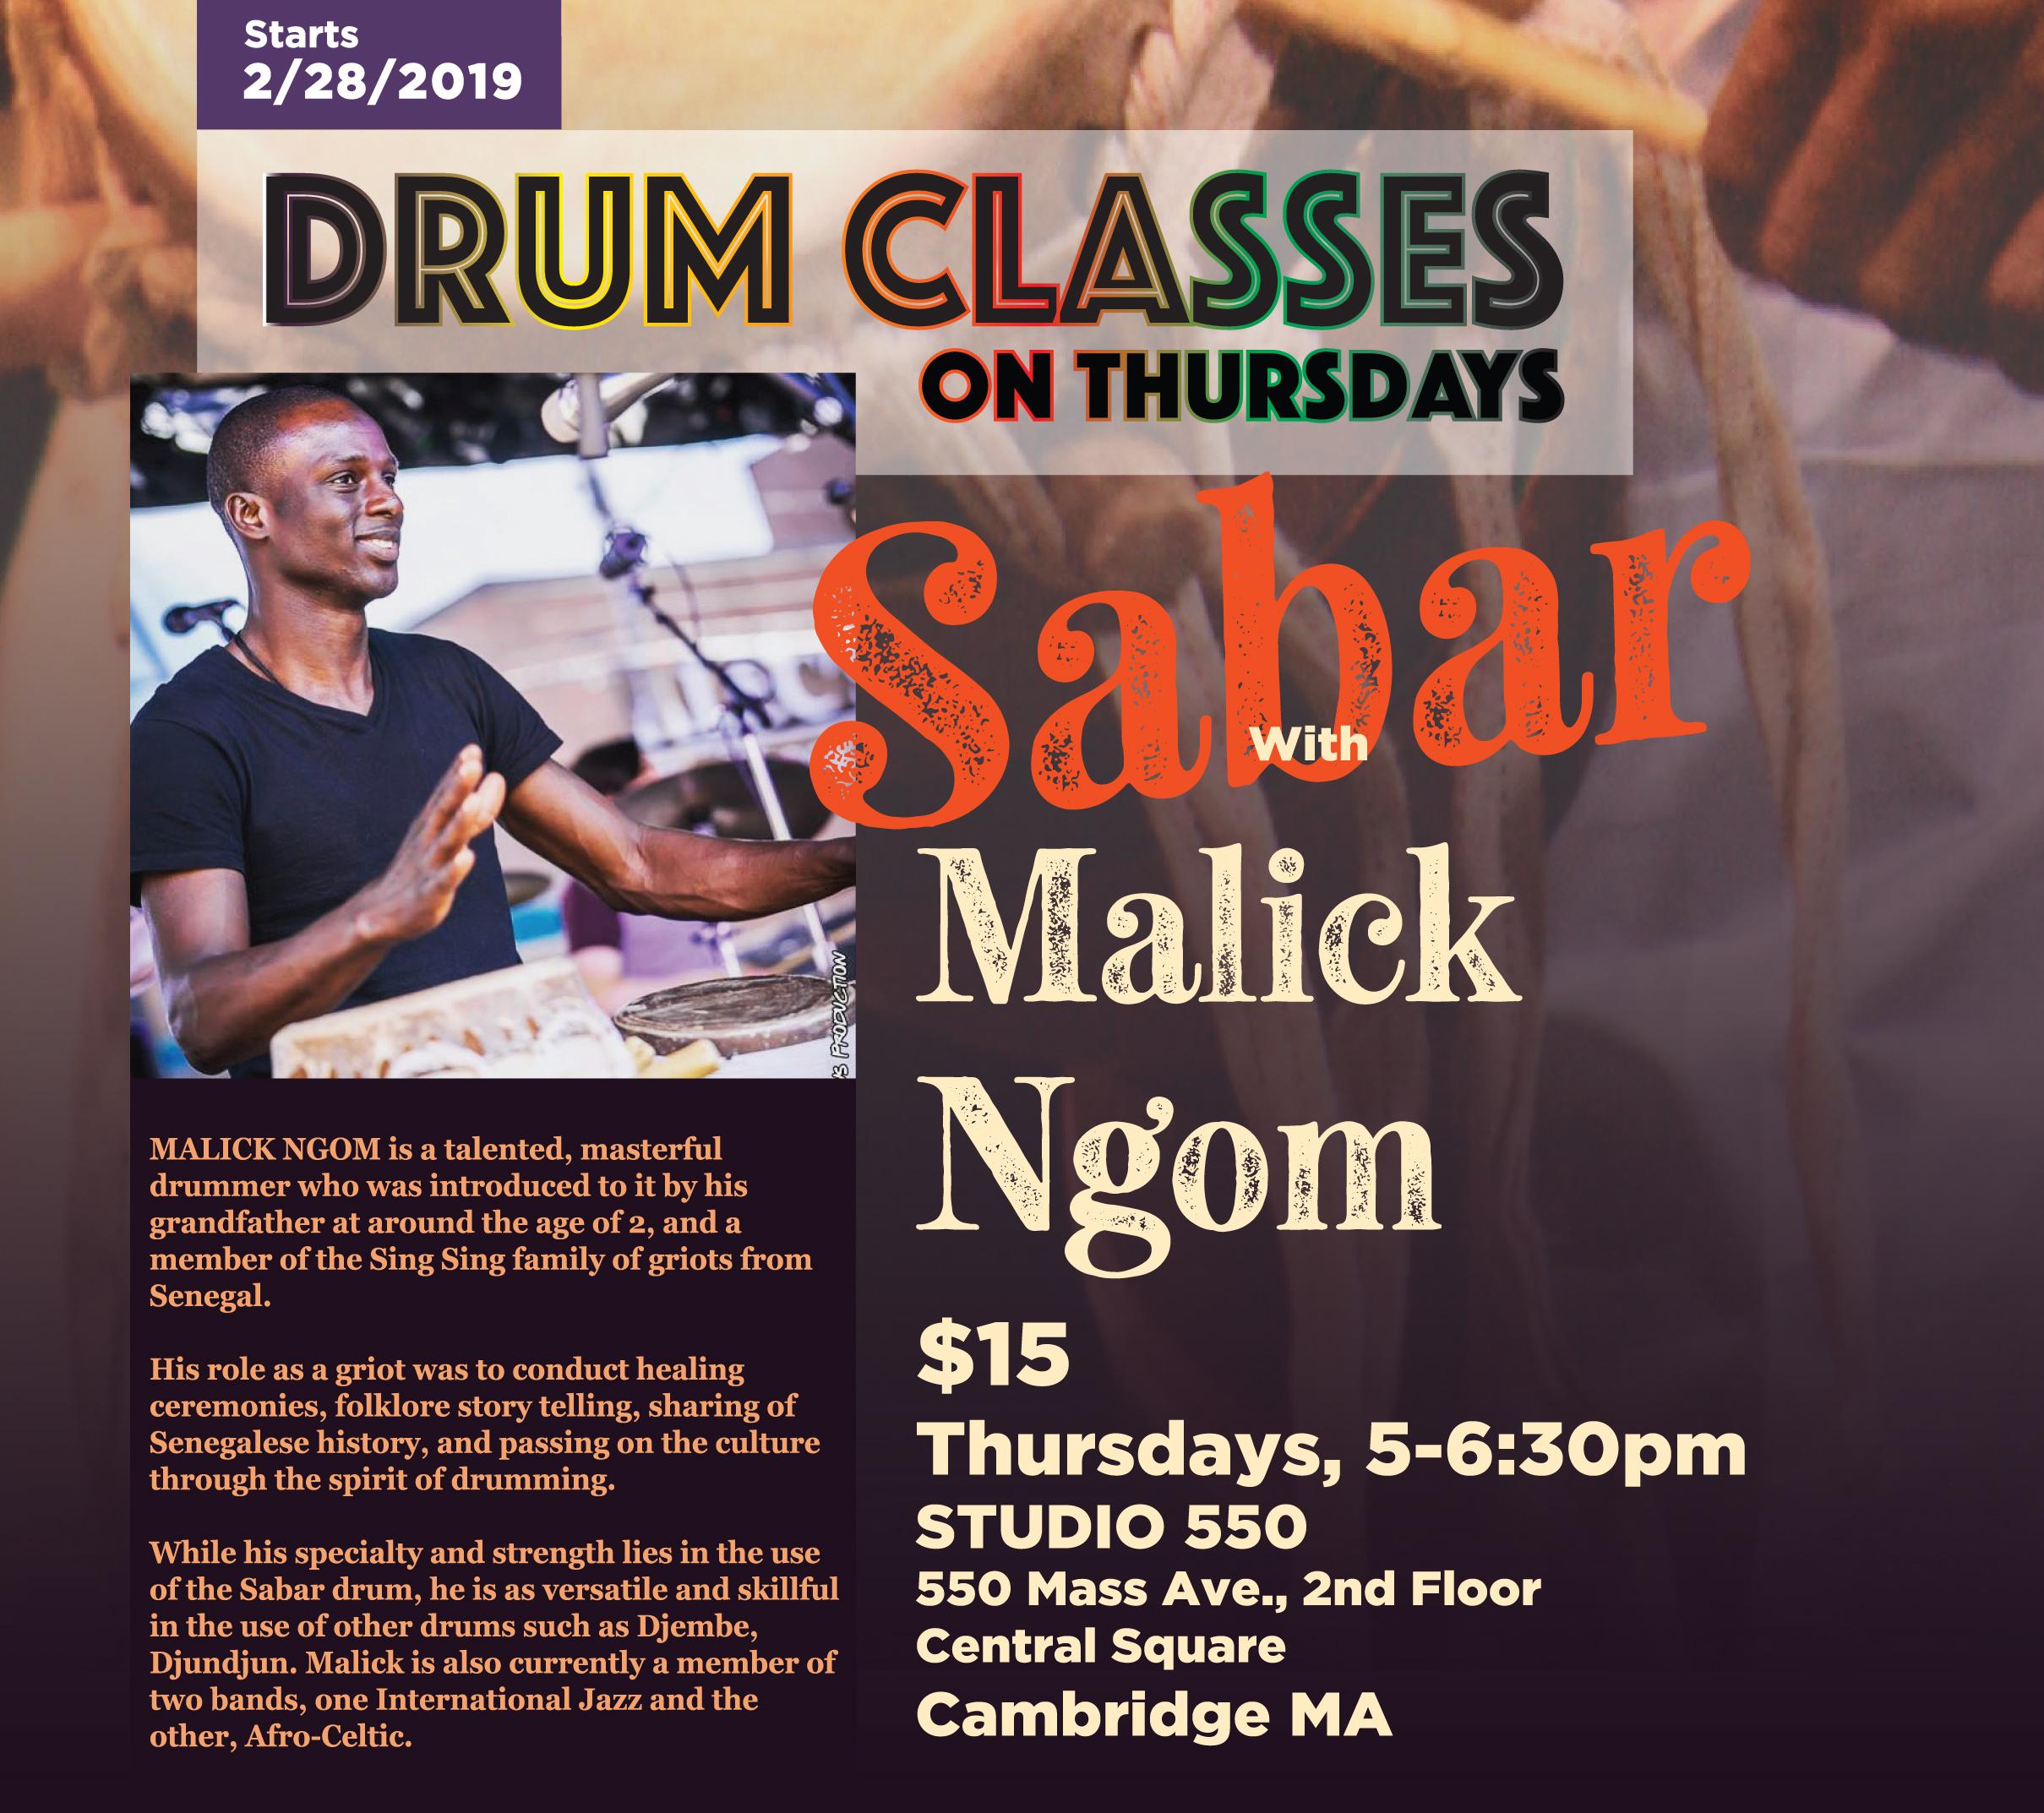 Sabar Drum Class with Malick Ngom